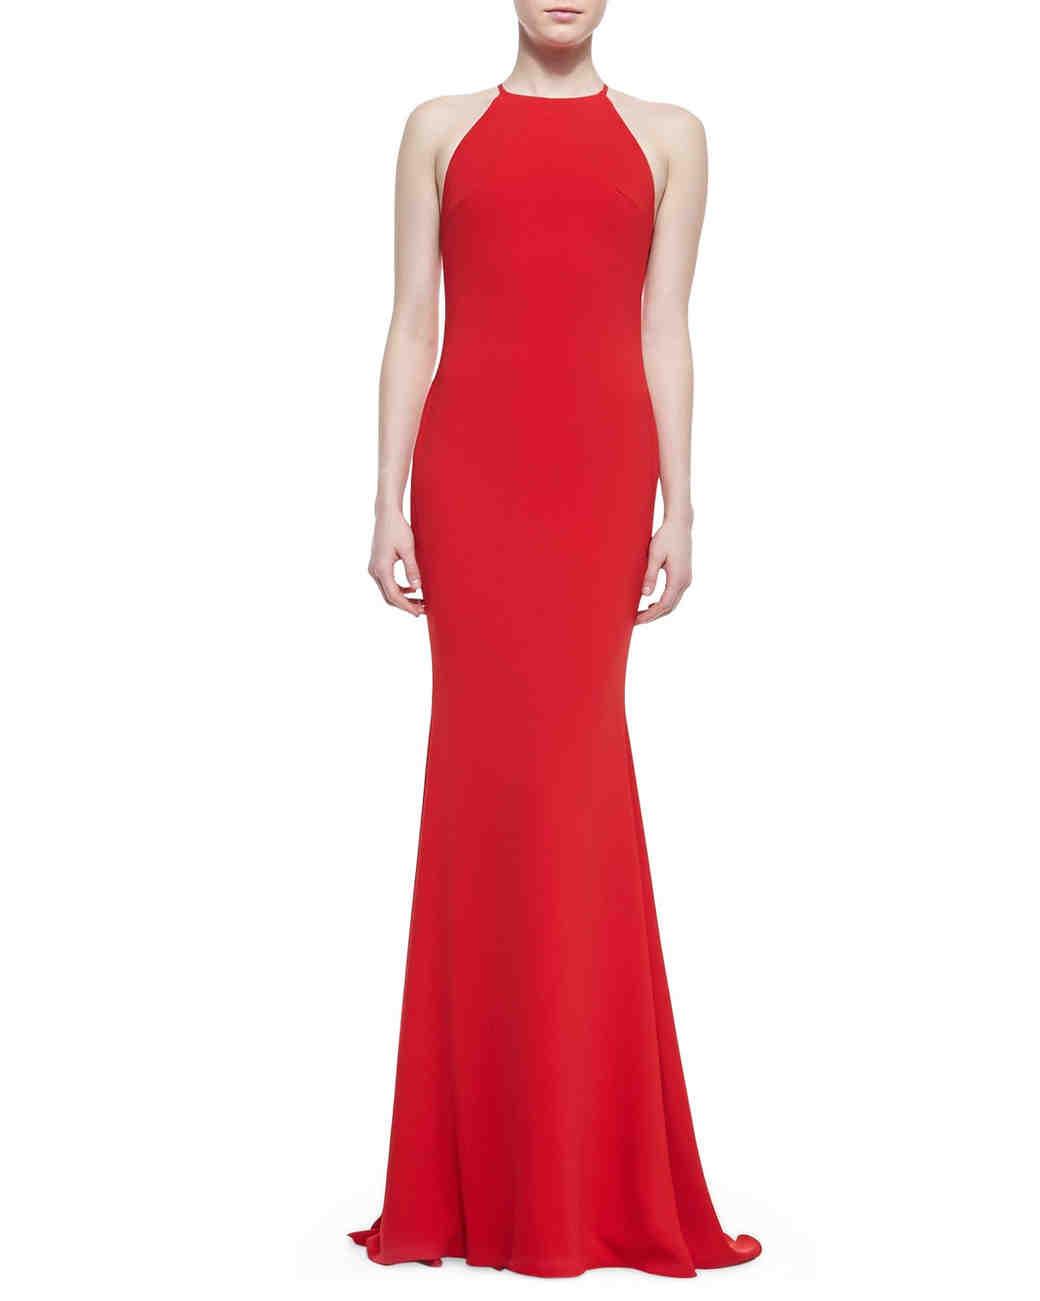 guest-wedding-outfits-badgley-mischka-mermaid-gown-0614.jpg